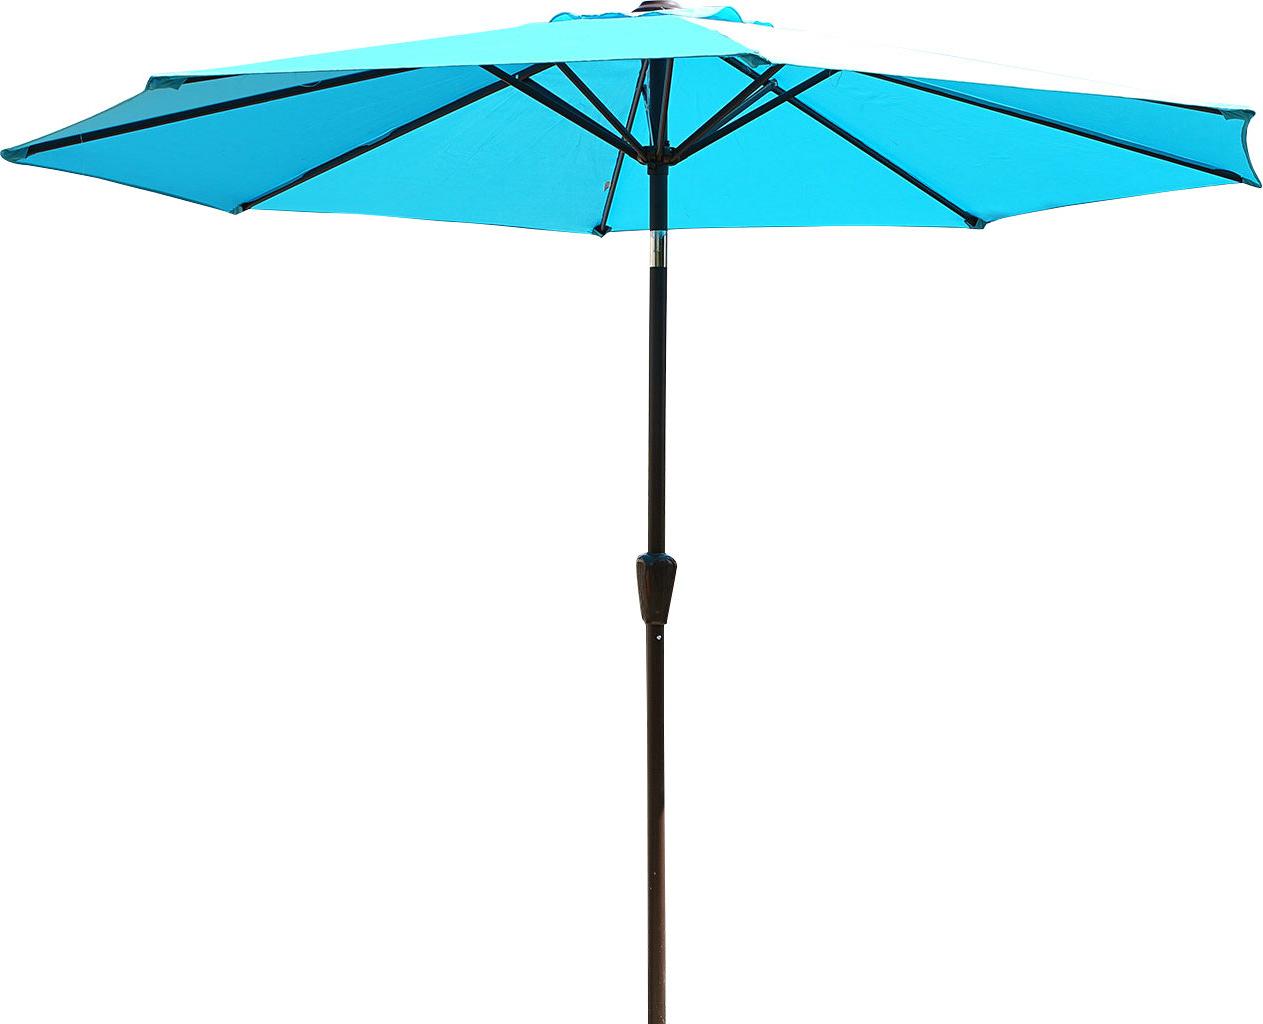 Taube 9' Market Umbrella Intended For Fashionable Zeman Market Umbrellas (View 11 of 20)